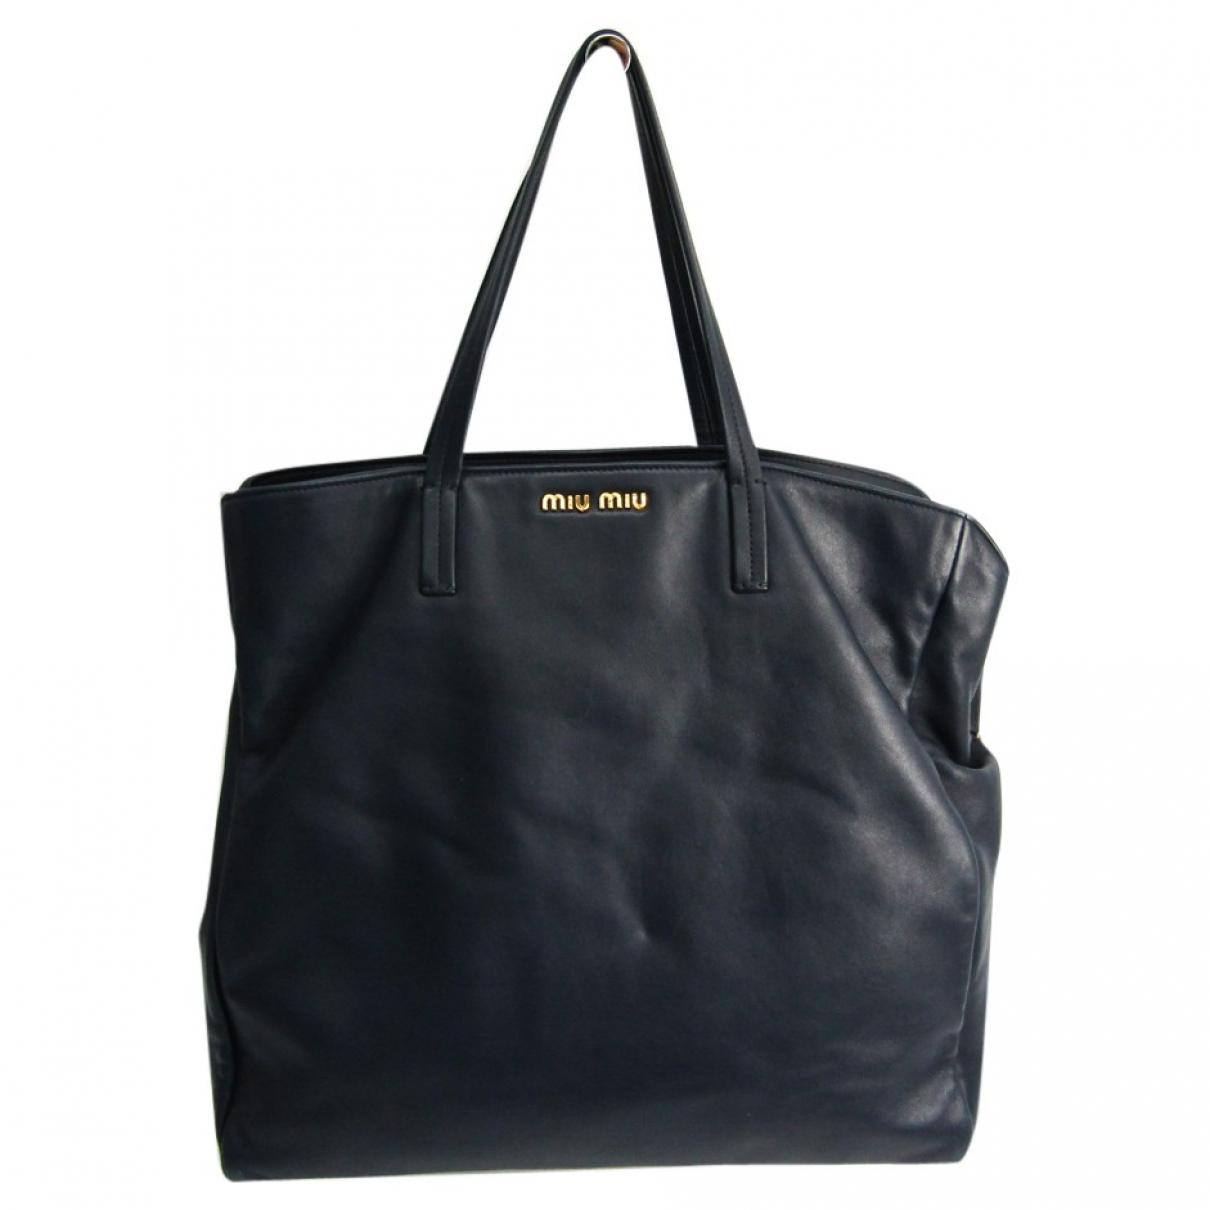 Miu Miu N Navy Leather handbag for Women N